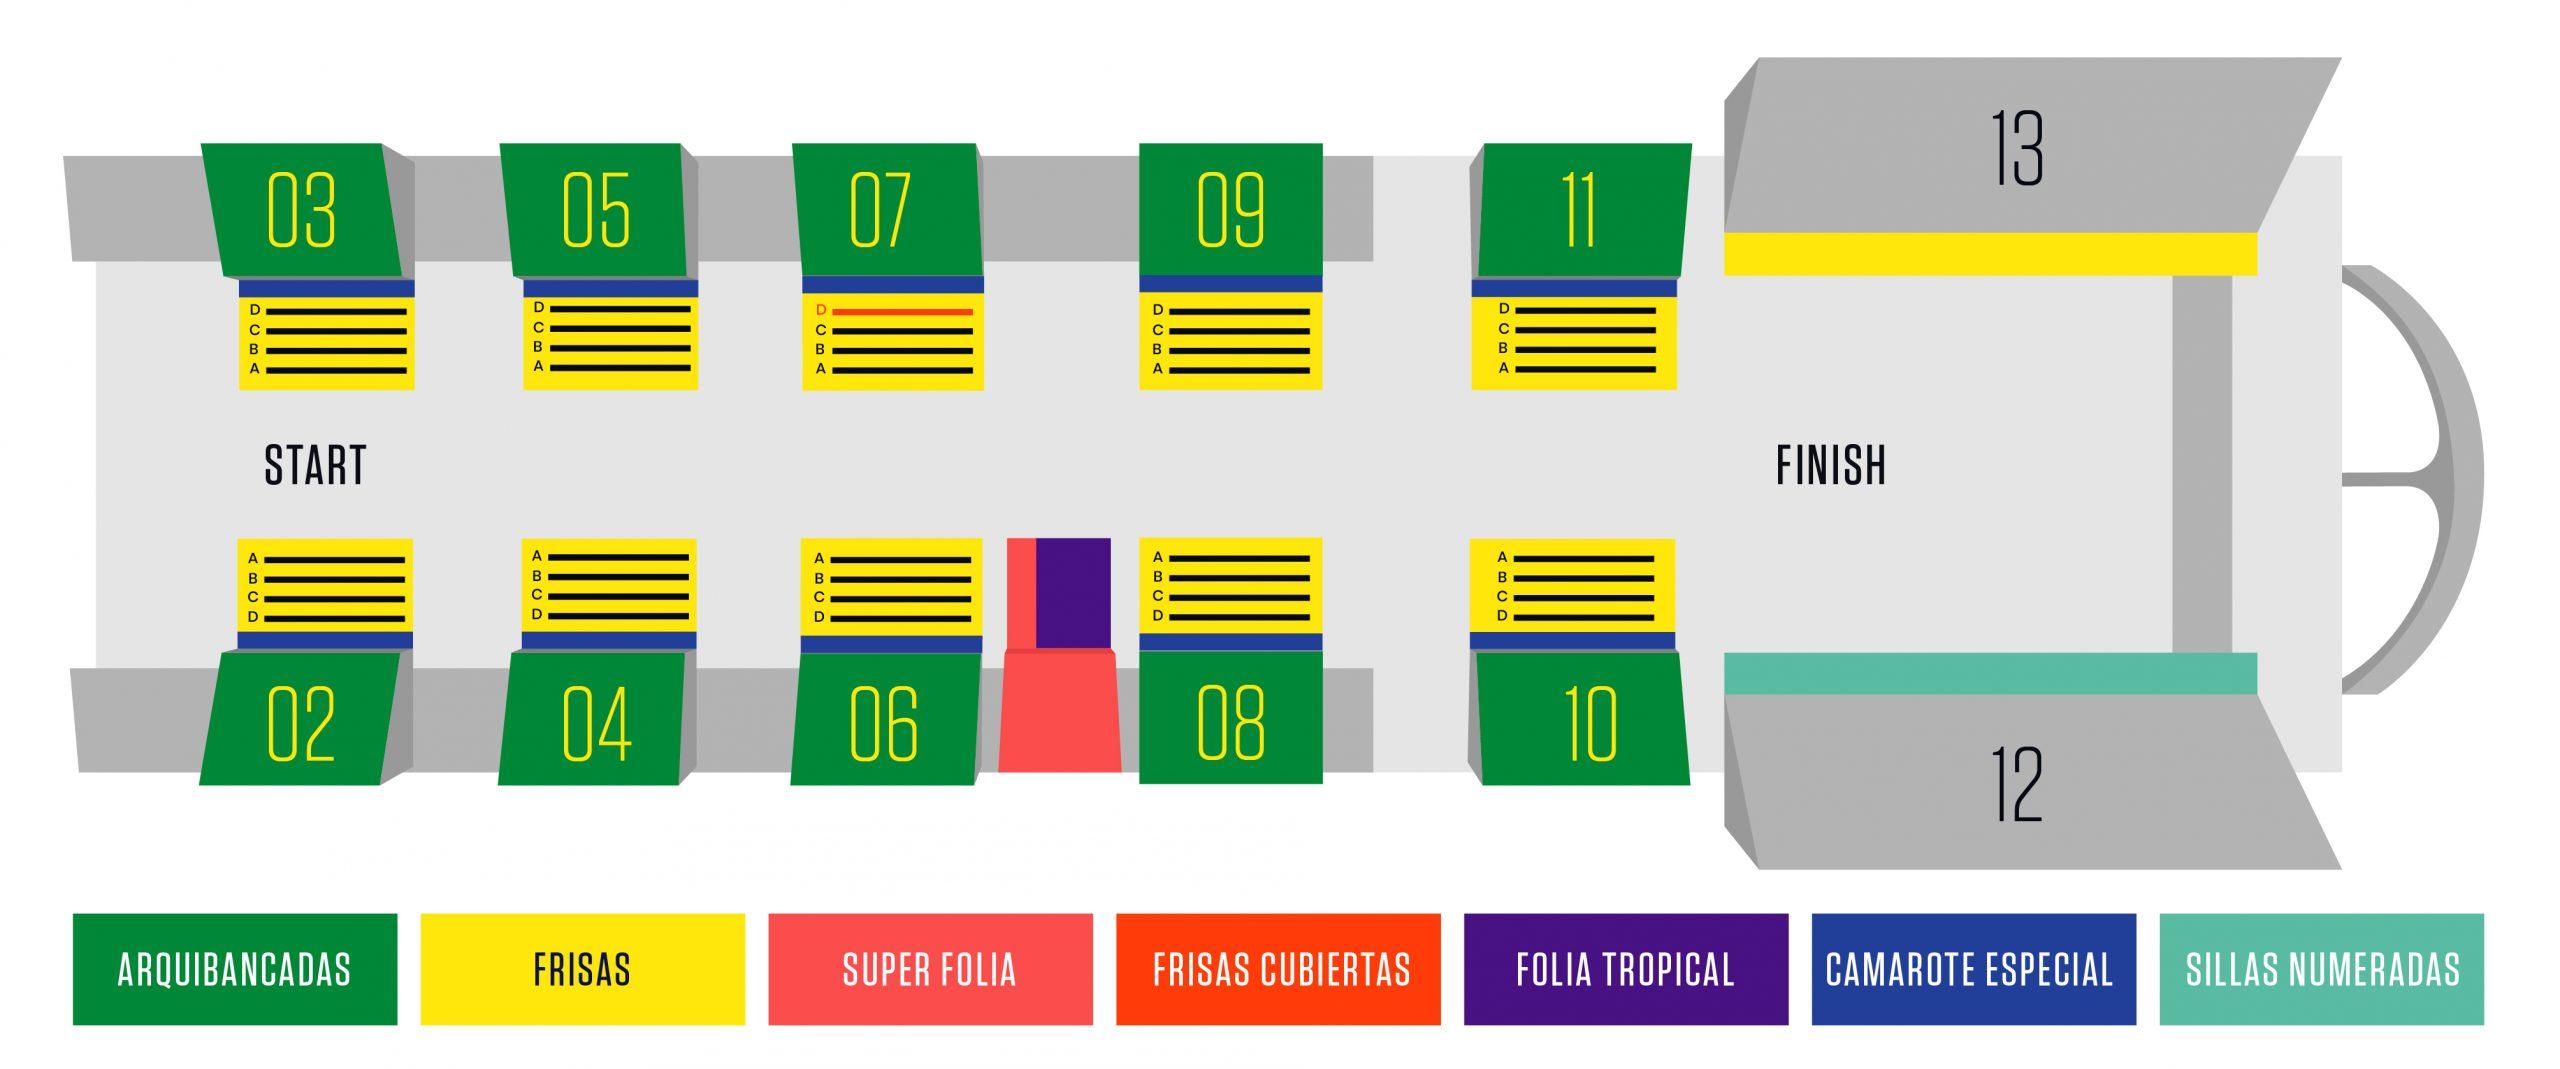 X-779-Caranval-Rio-Mapa_-Final-03.jpg